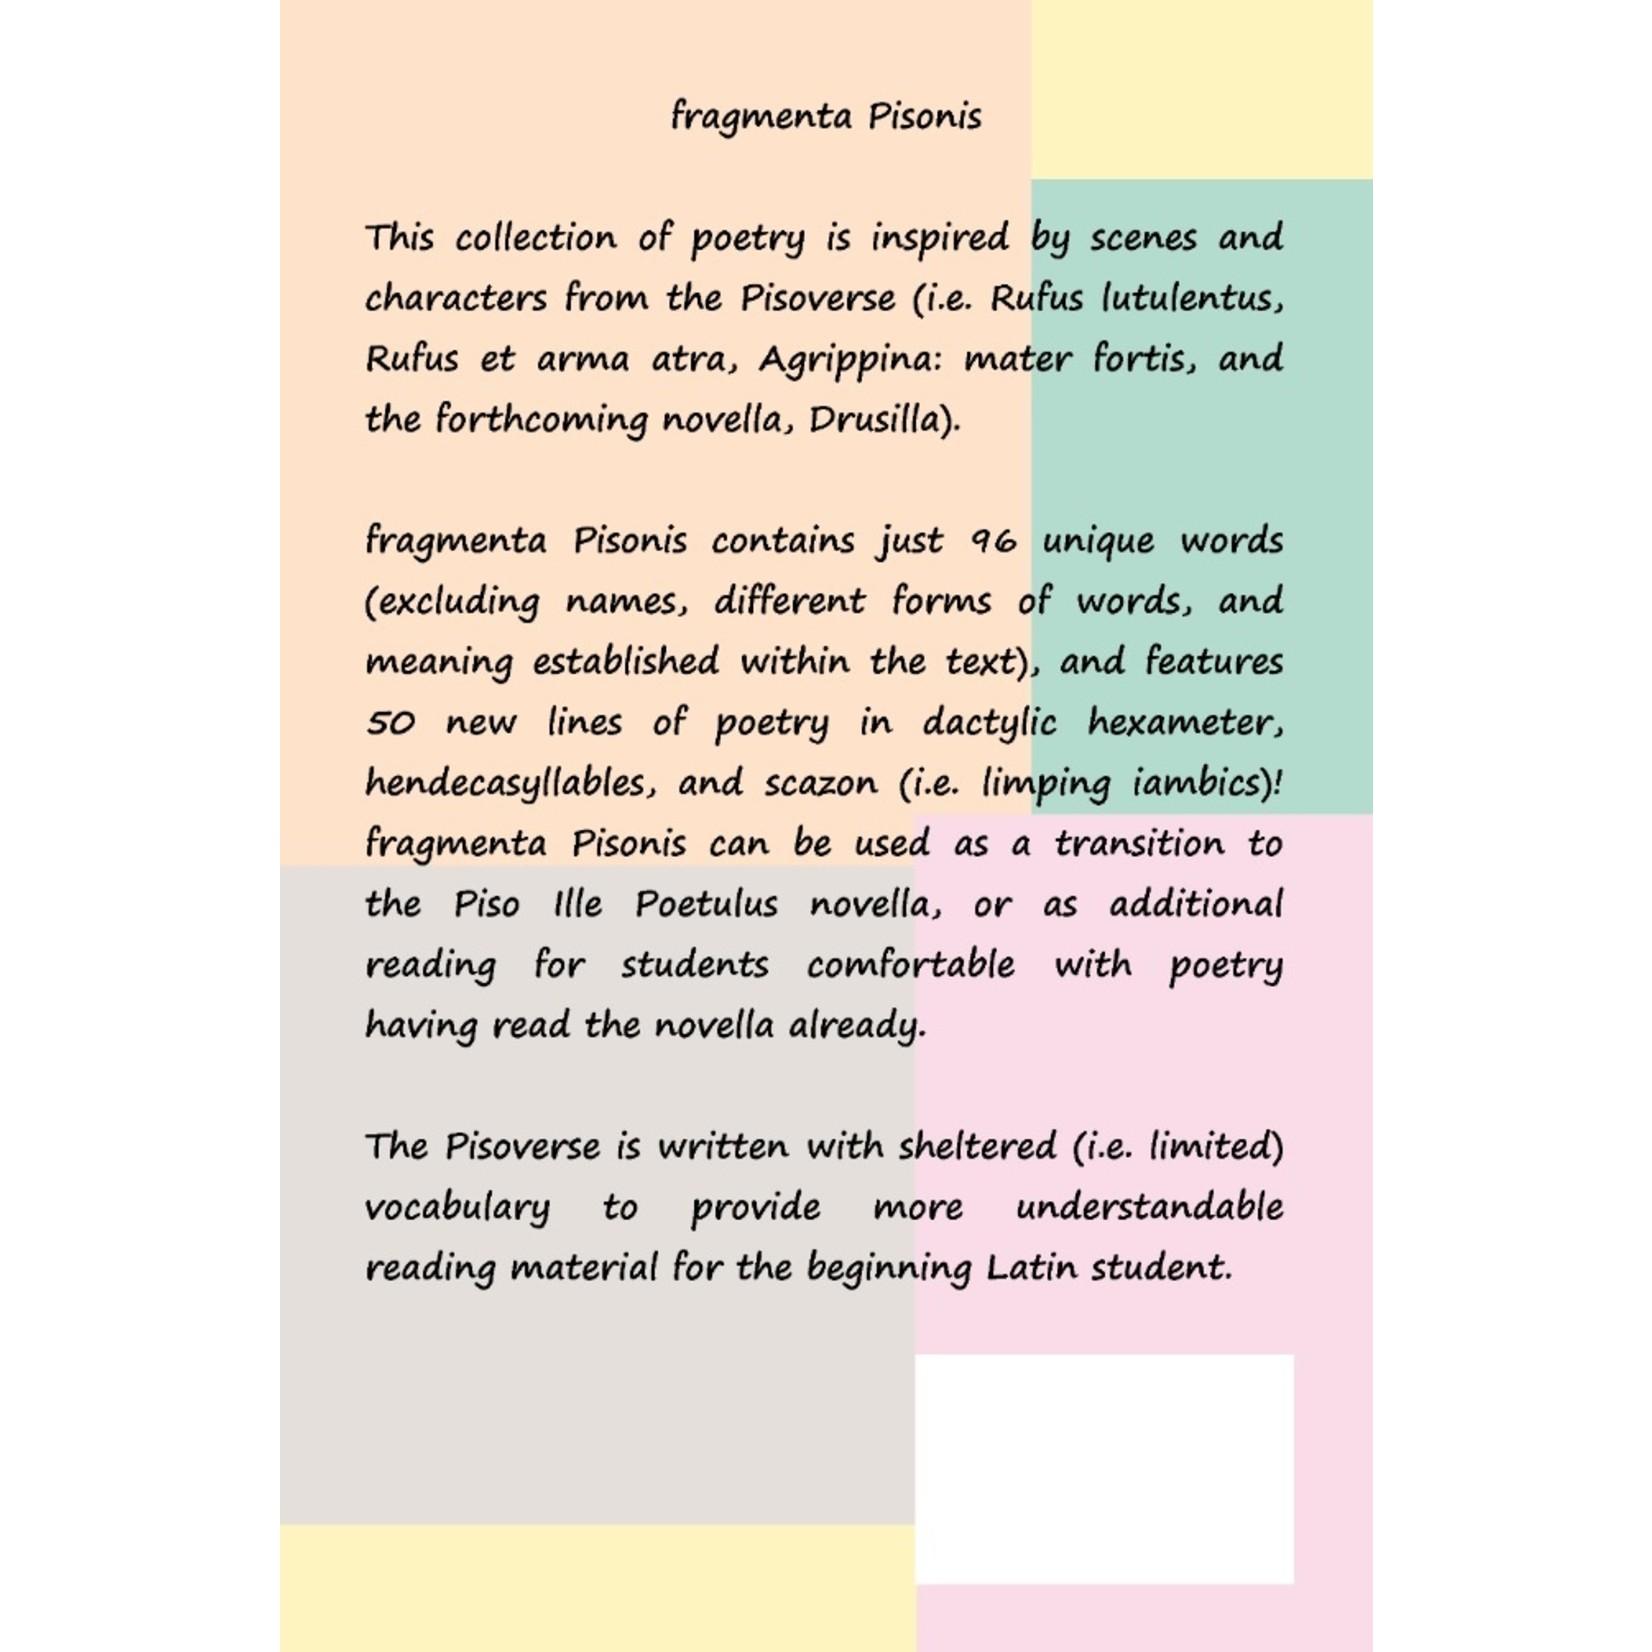 Magister P fragmenta Pīsōnis